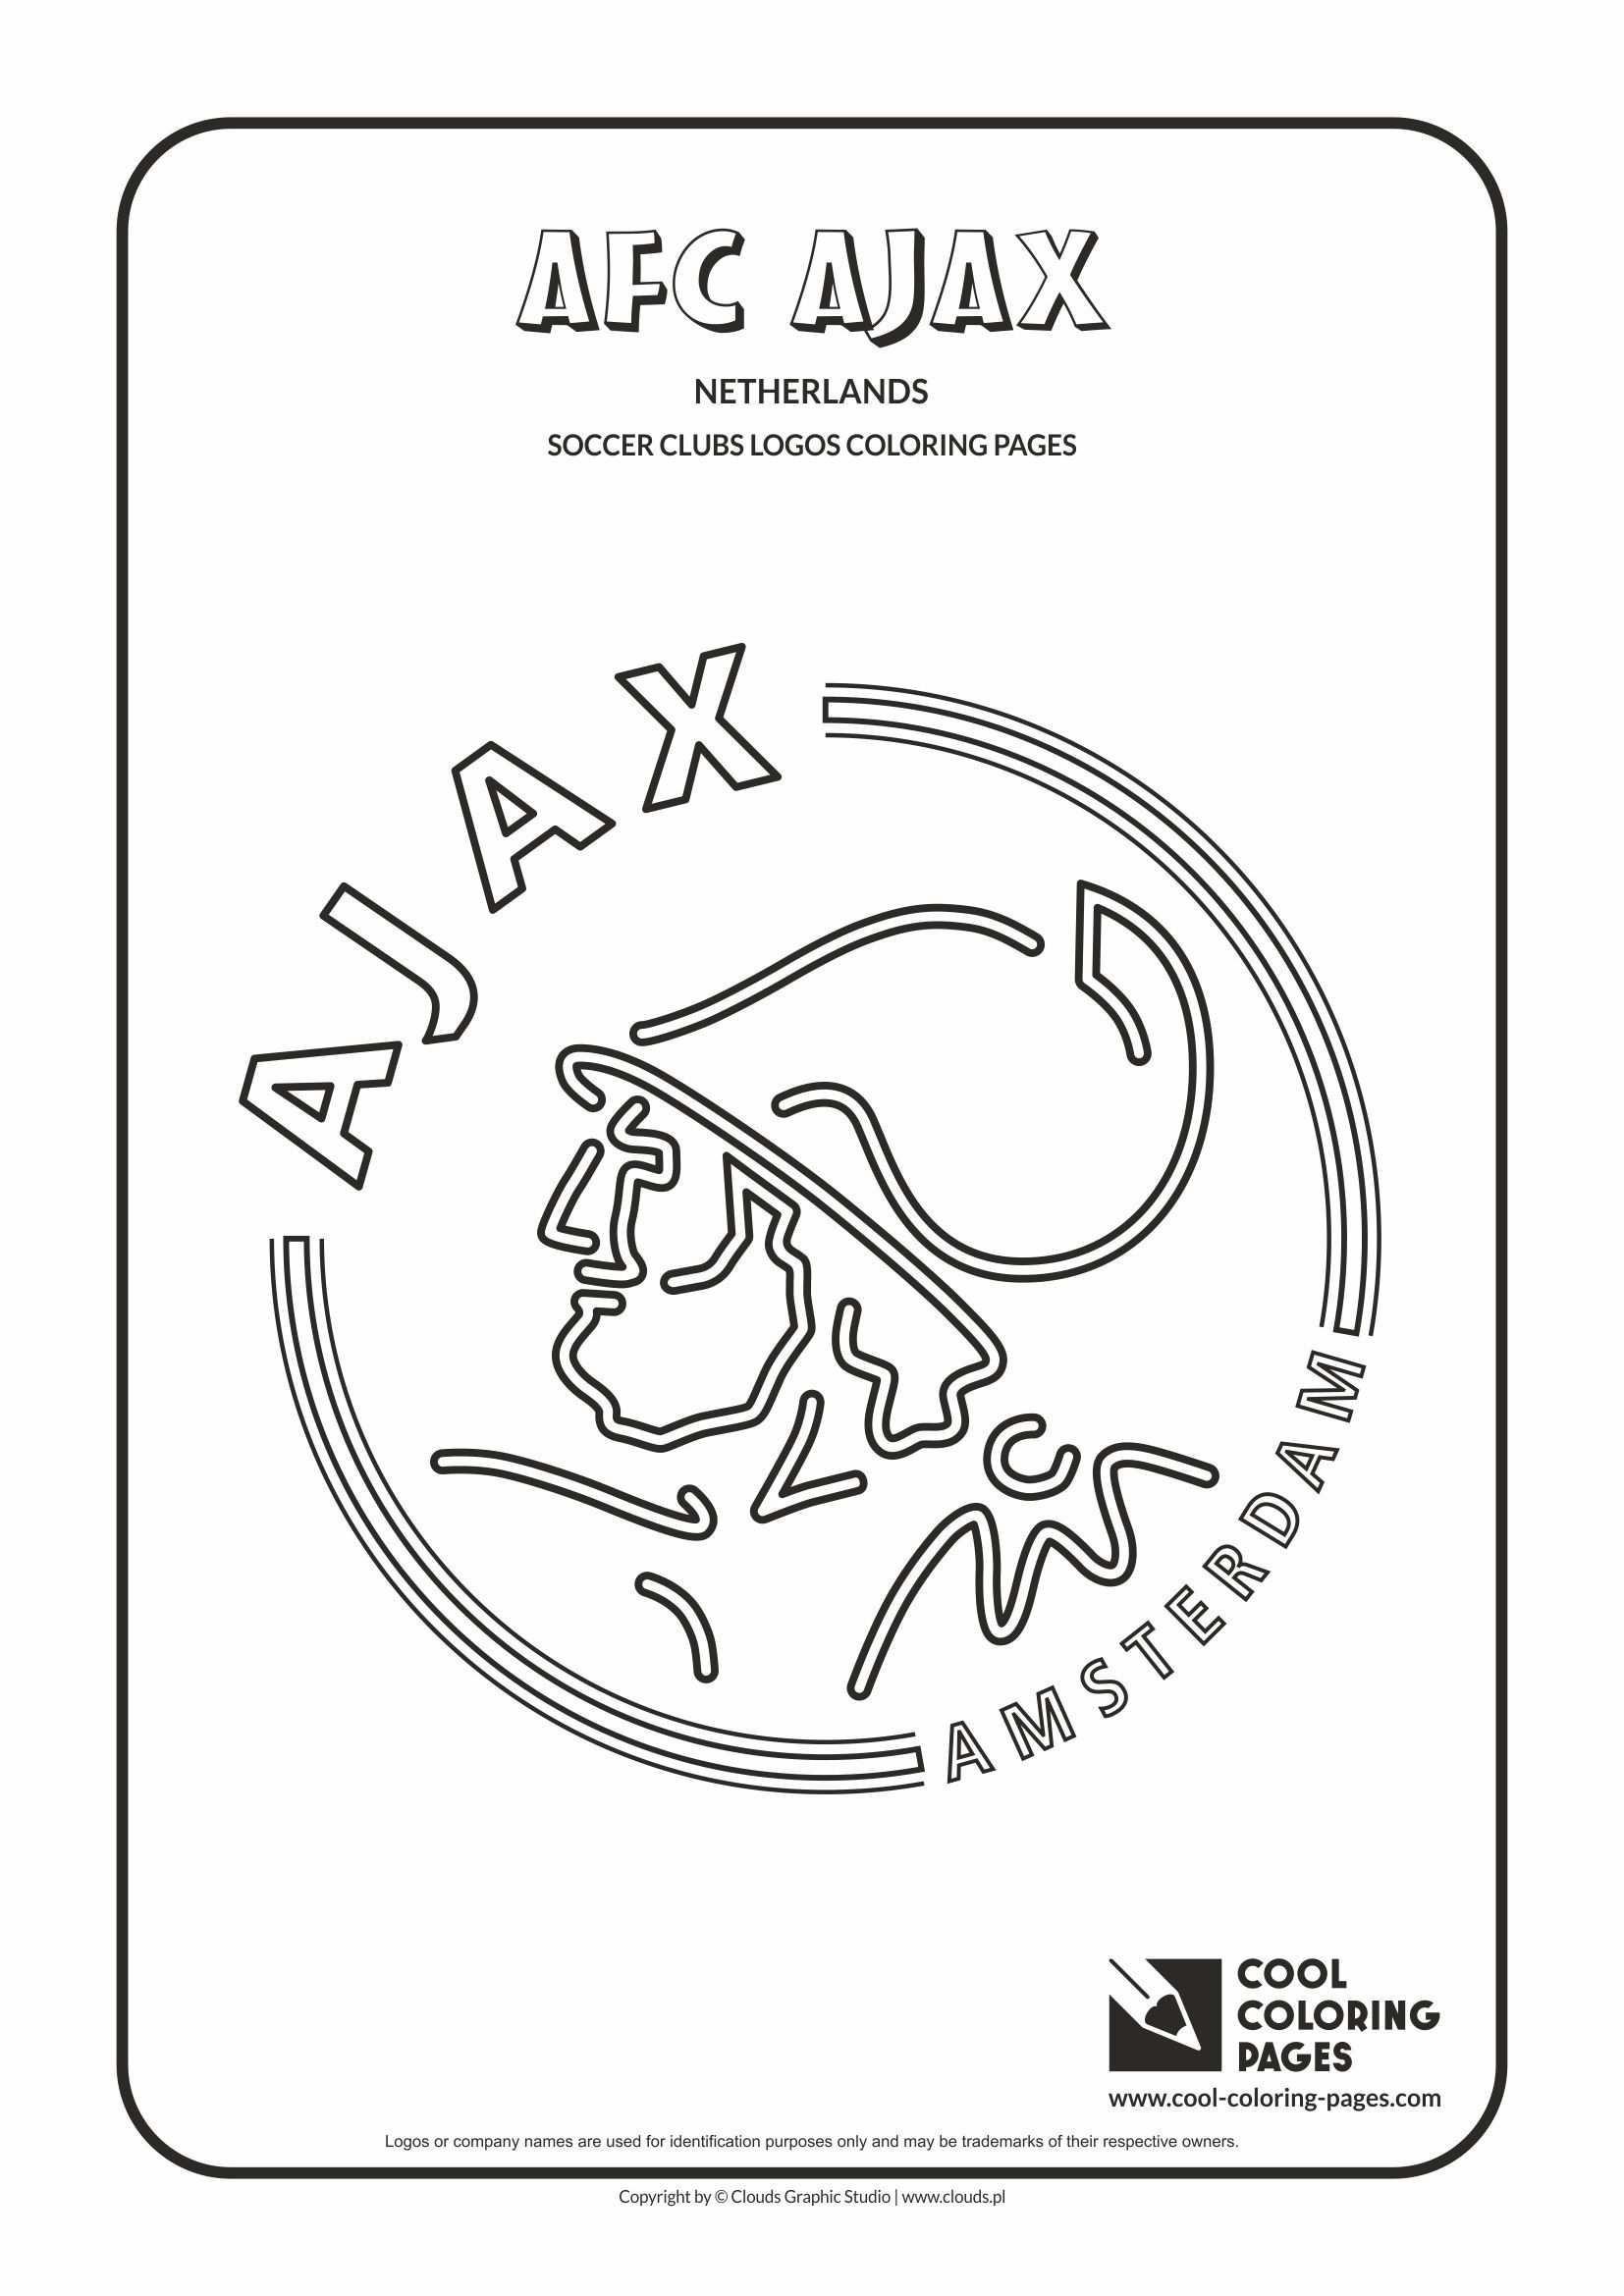 Afc Ajax Amsterdam Logo Coloring Page Kleurplaten Boek Vouwen